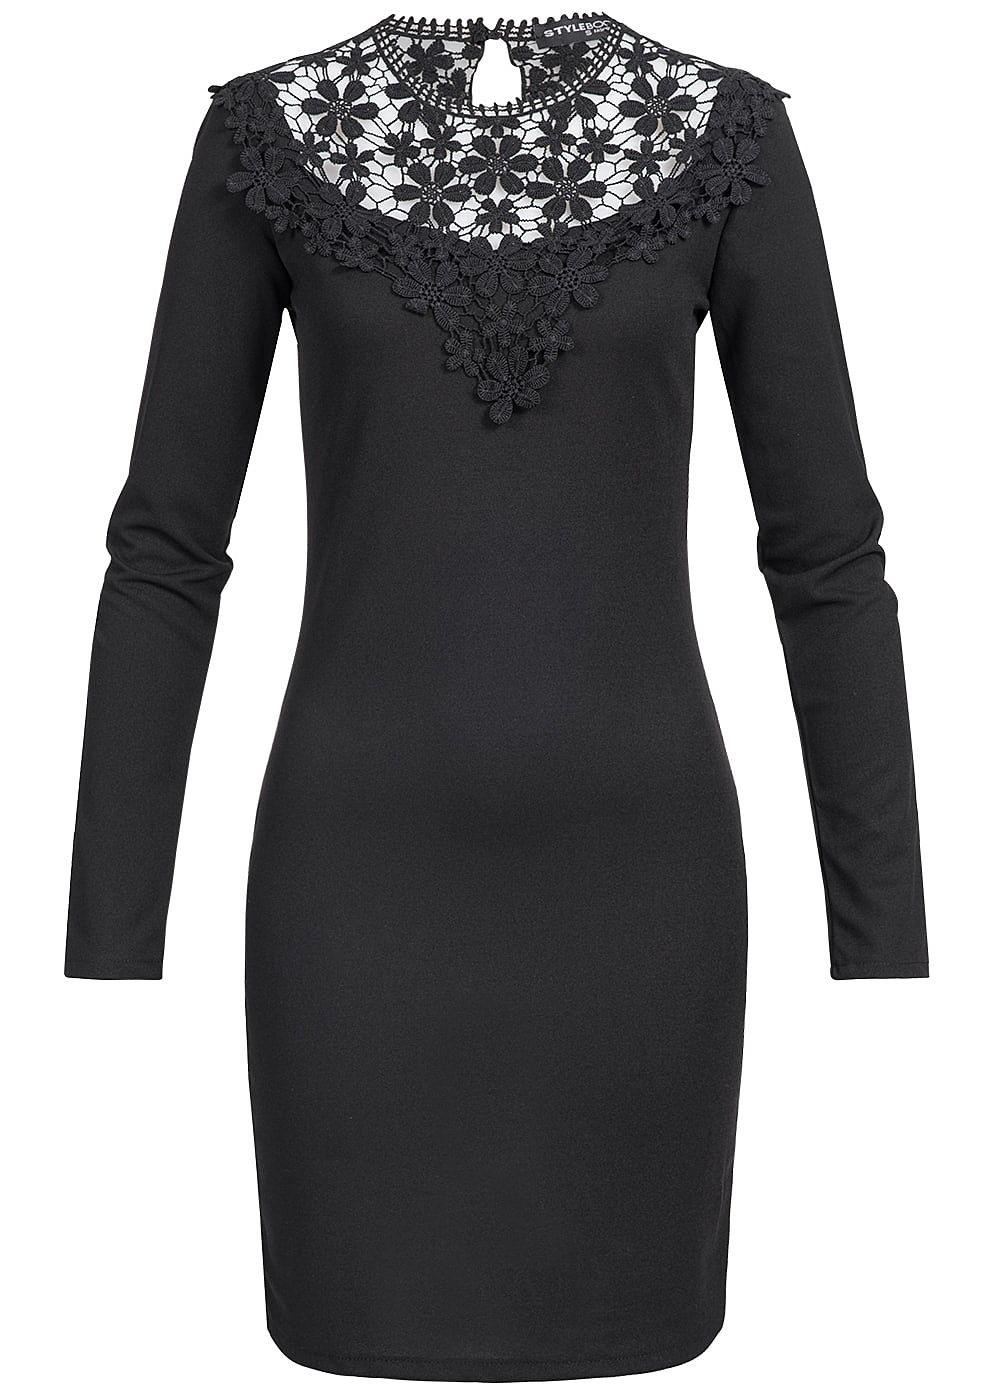 17 Einzigartig Kleid Spitze Langarm Ärmel13 Genial Kleid Spitze Langarm Spezialgebiet